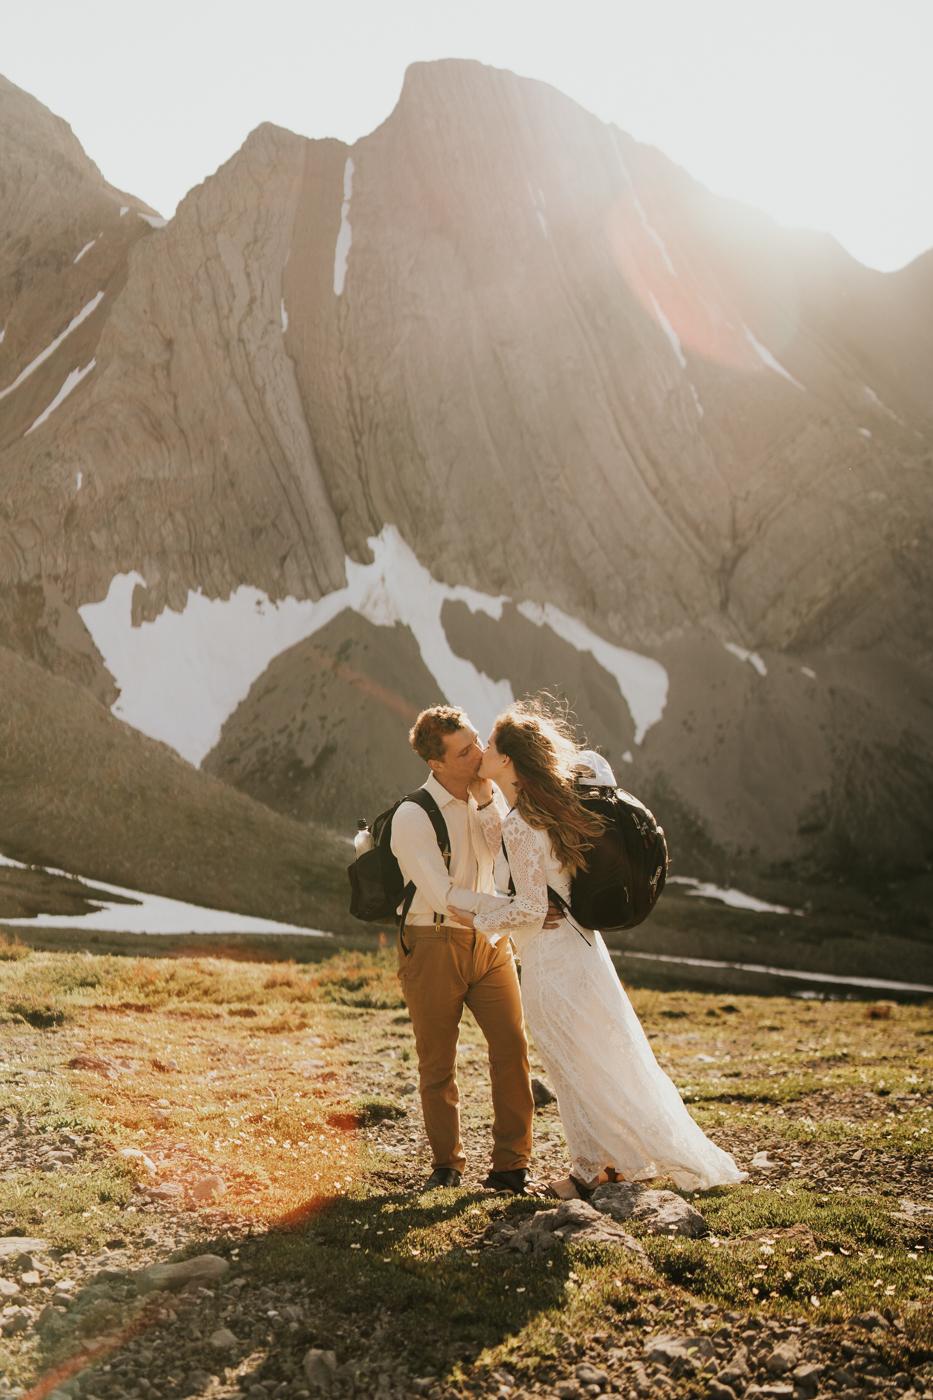 tyraephotography_photographer_wedding_elopement_engagement_photography-08477.jpg